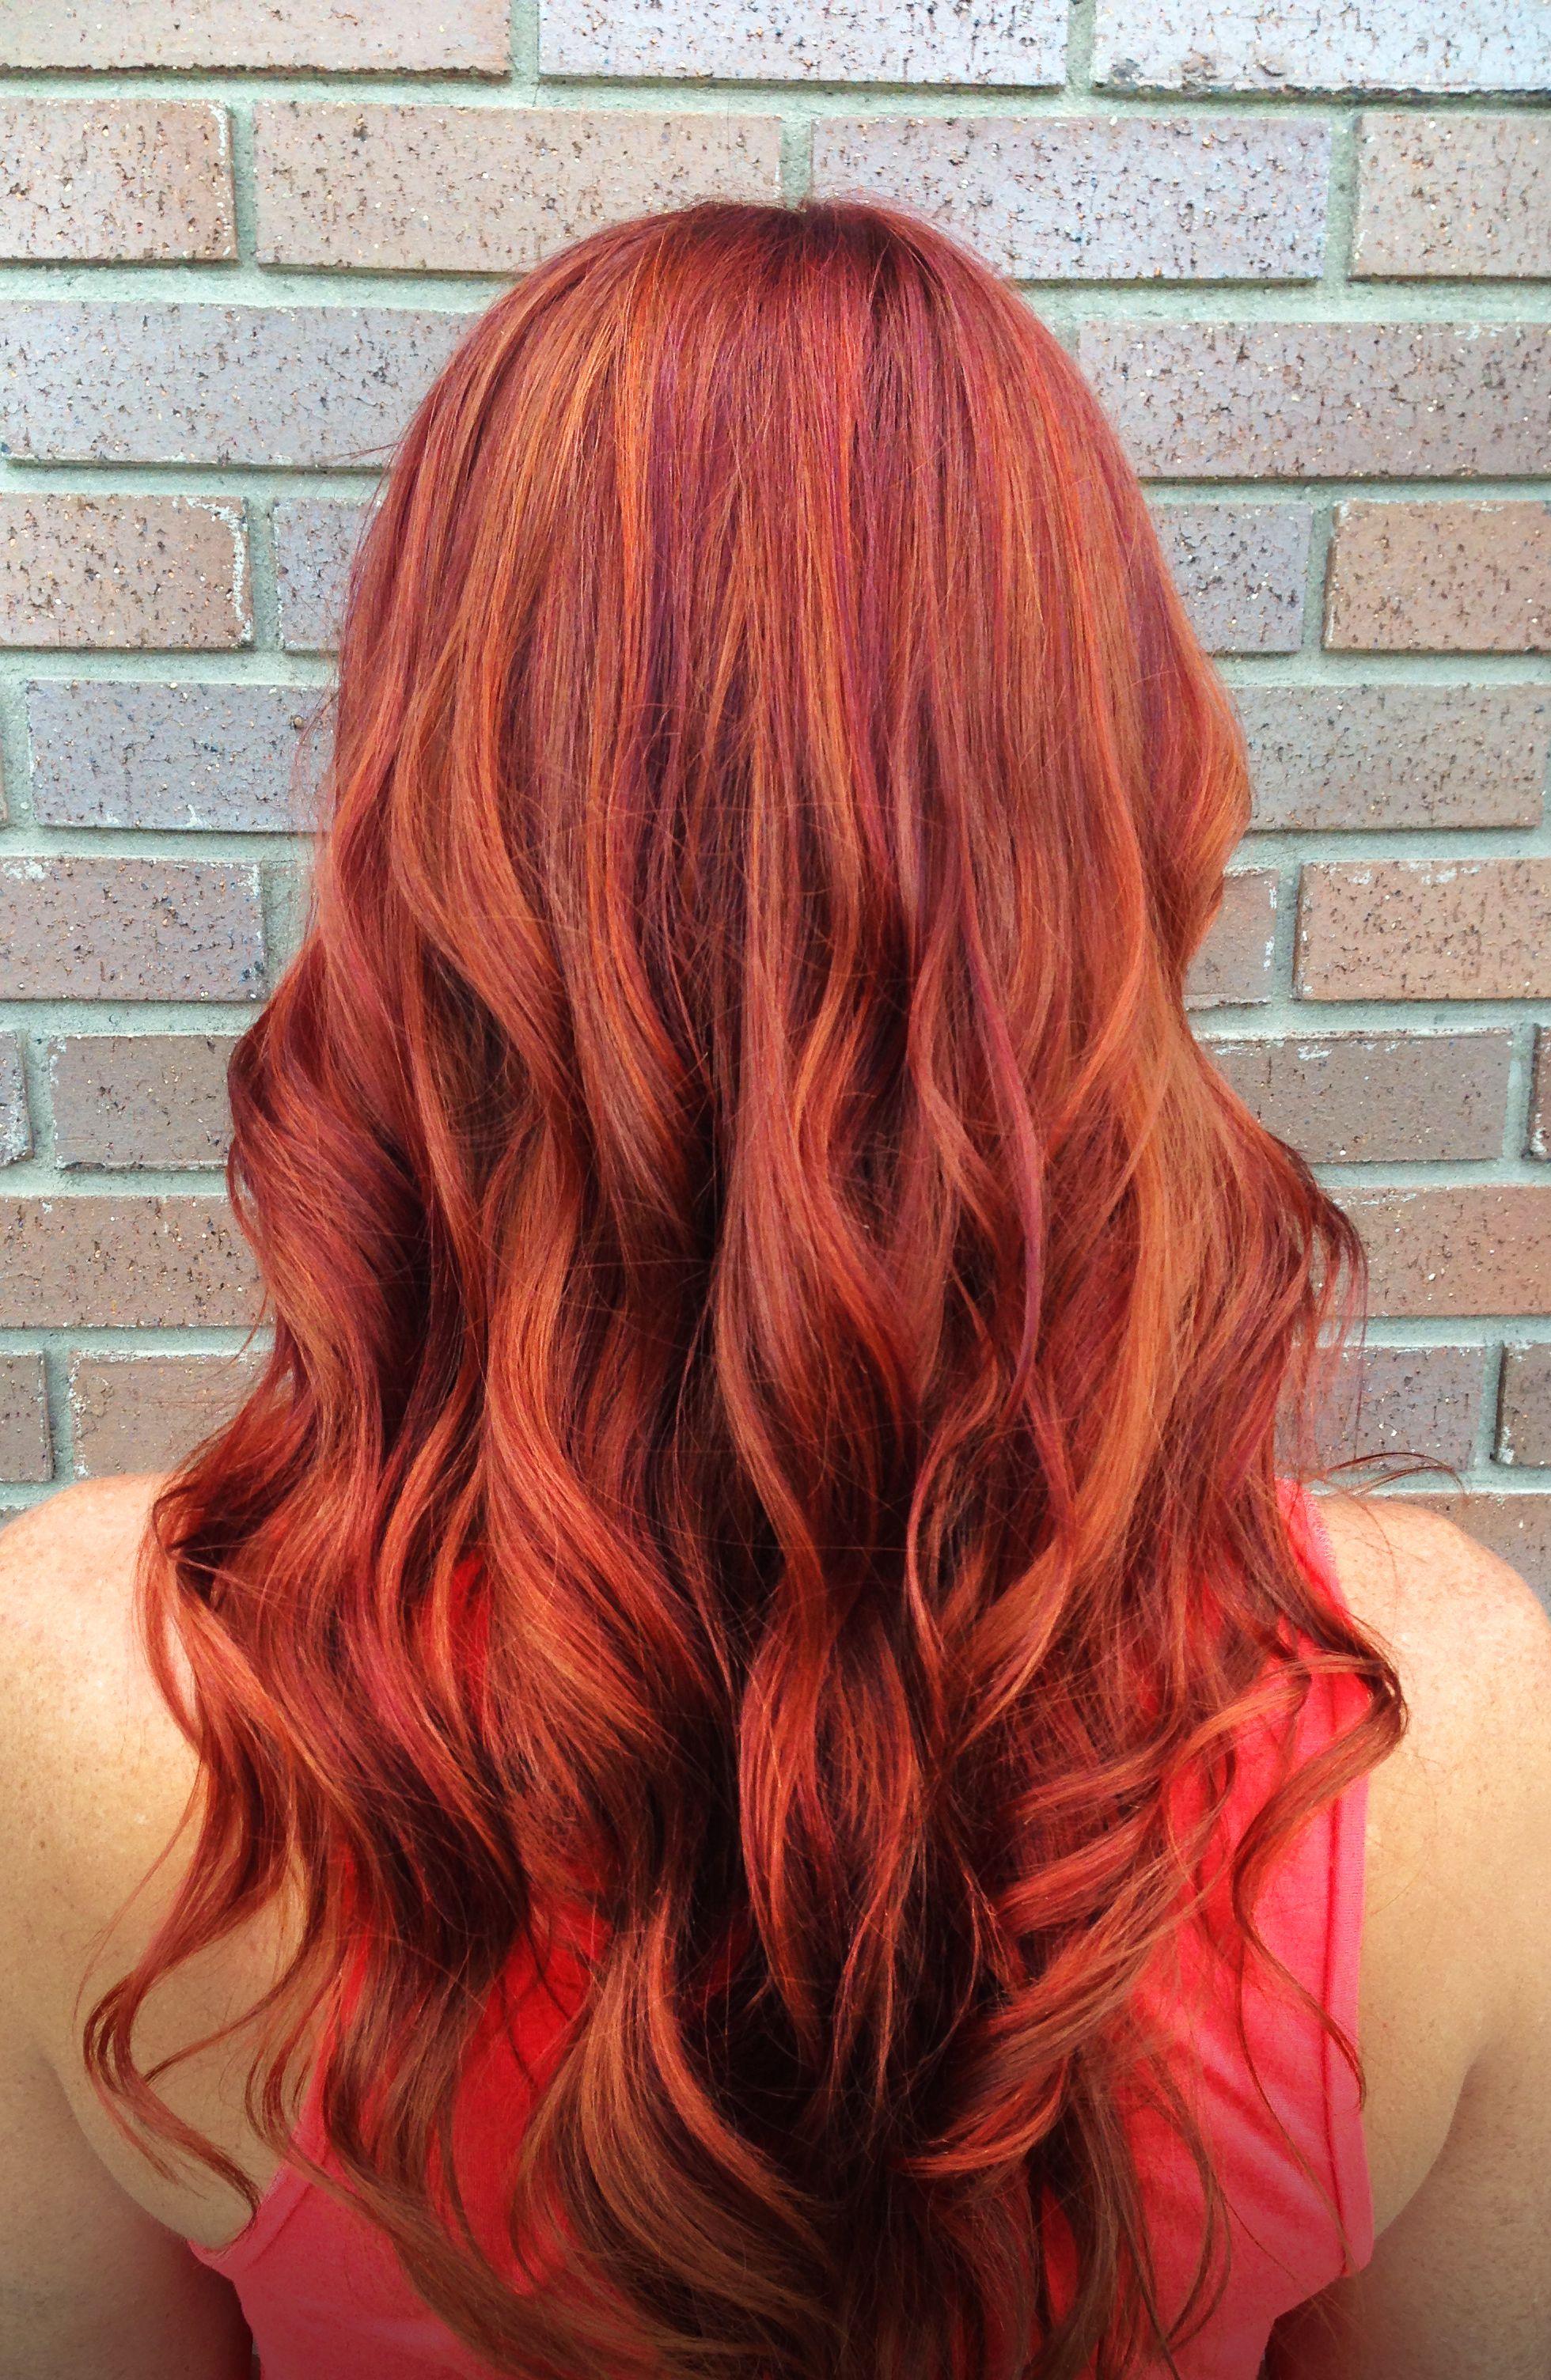 Pravana 7cc carli red orange hair color red hair pinterest pravana 7cc carli red orange hair color pmusecretfo Gallery